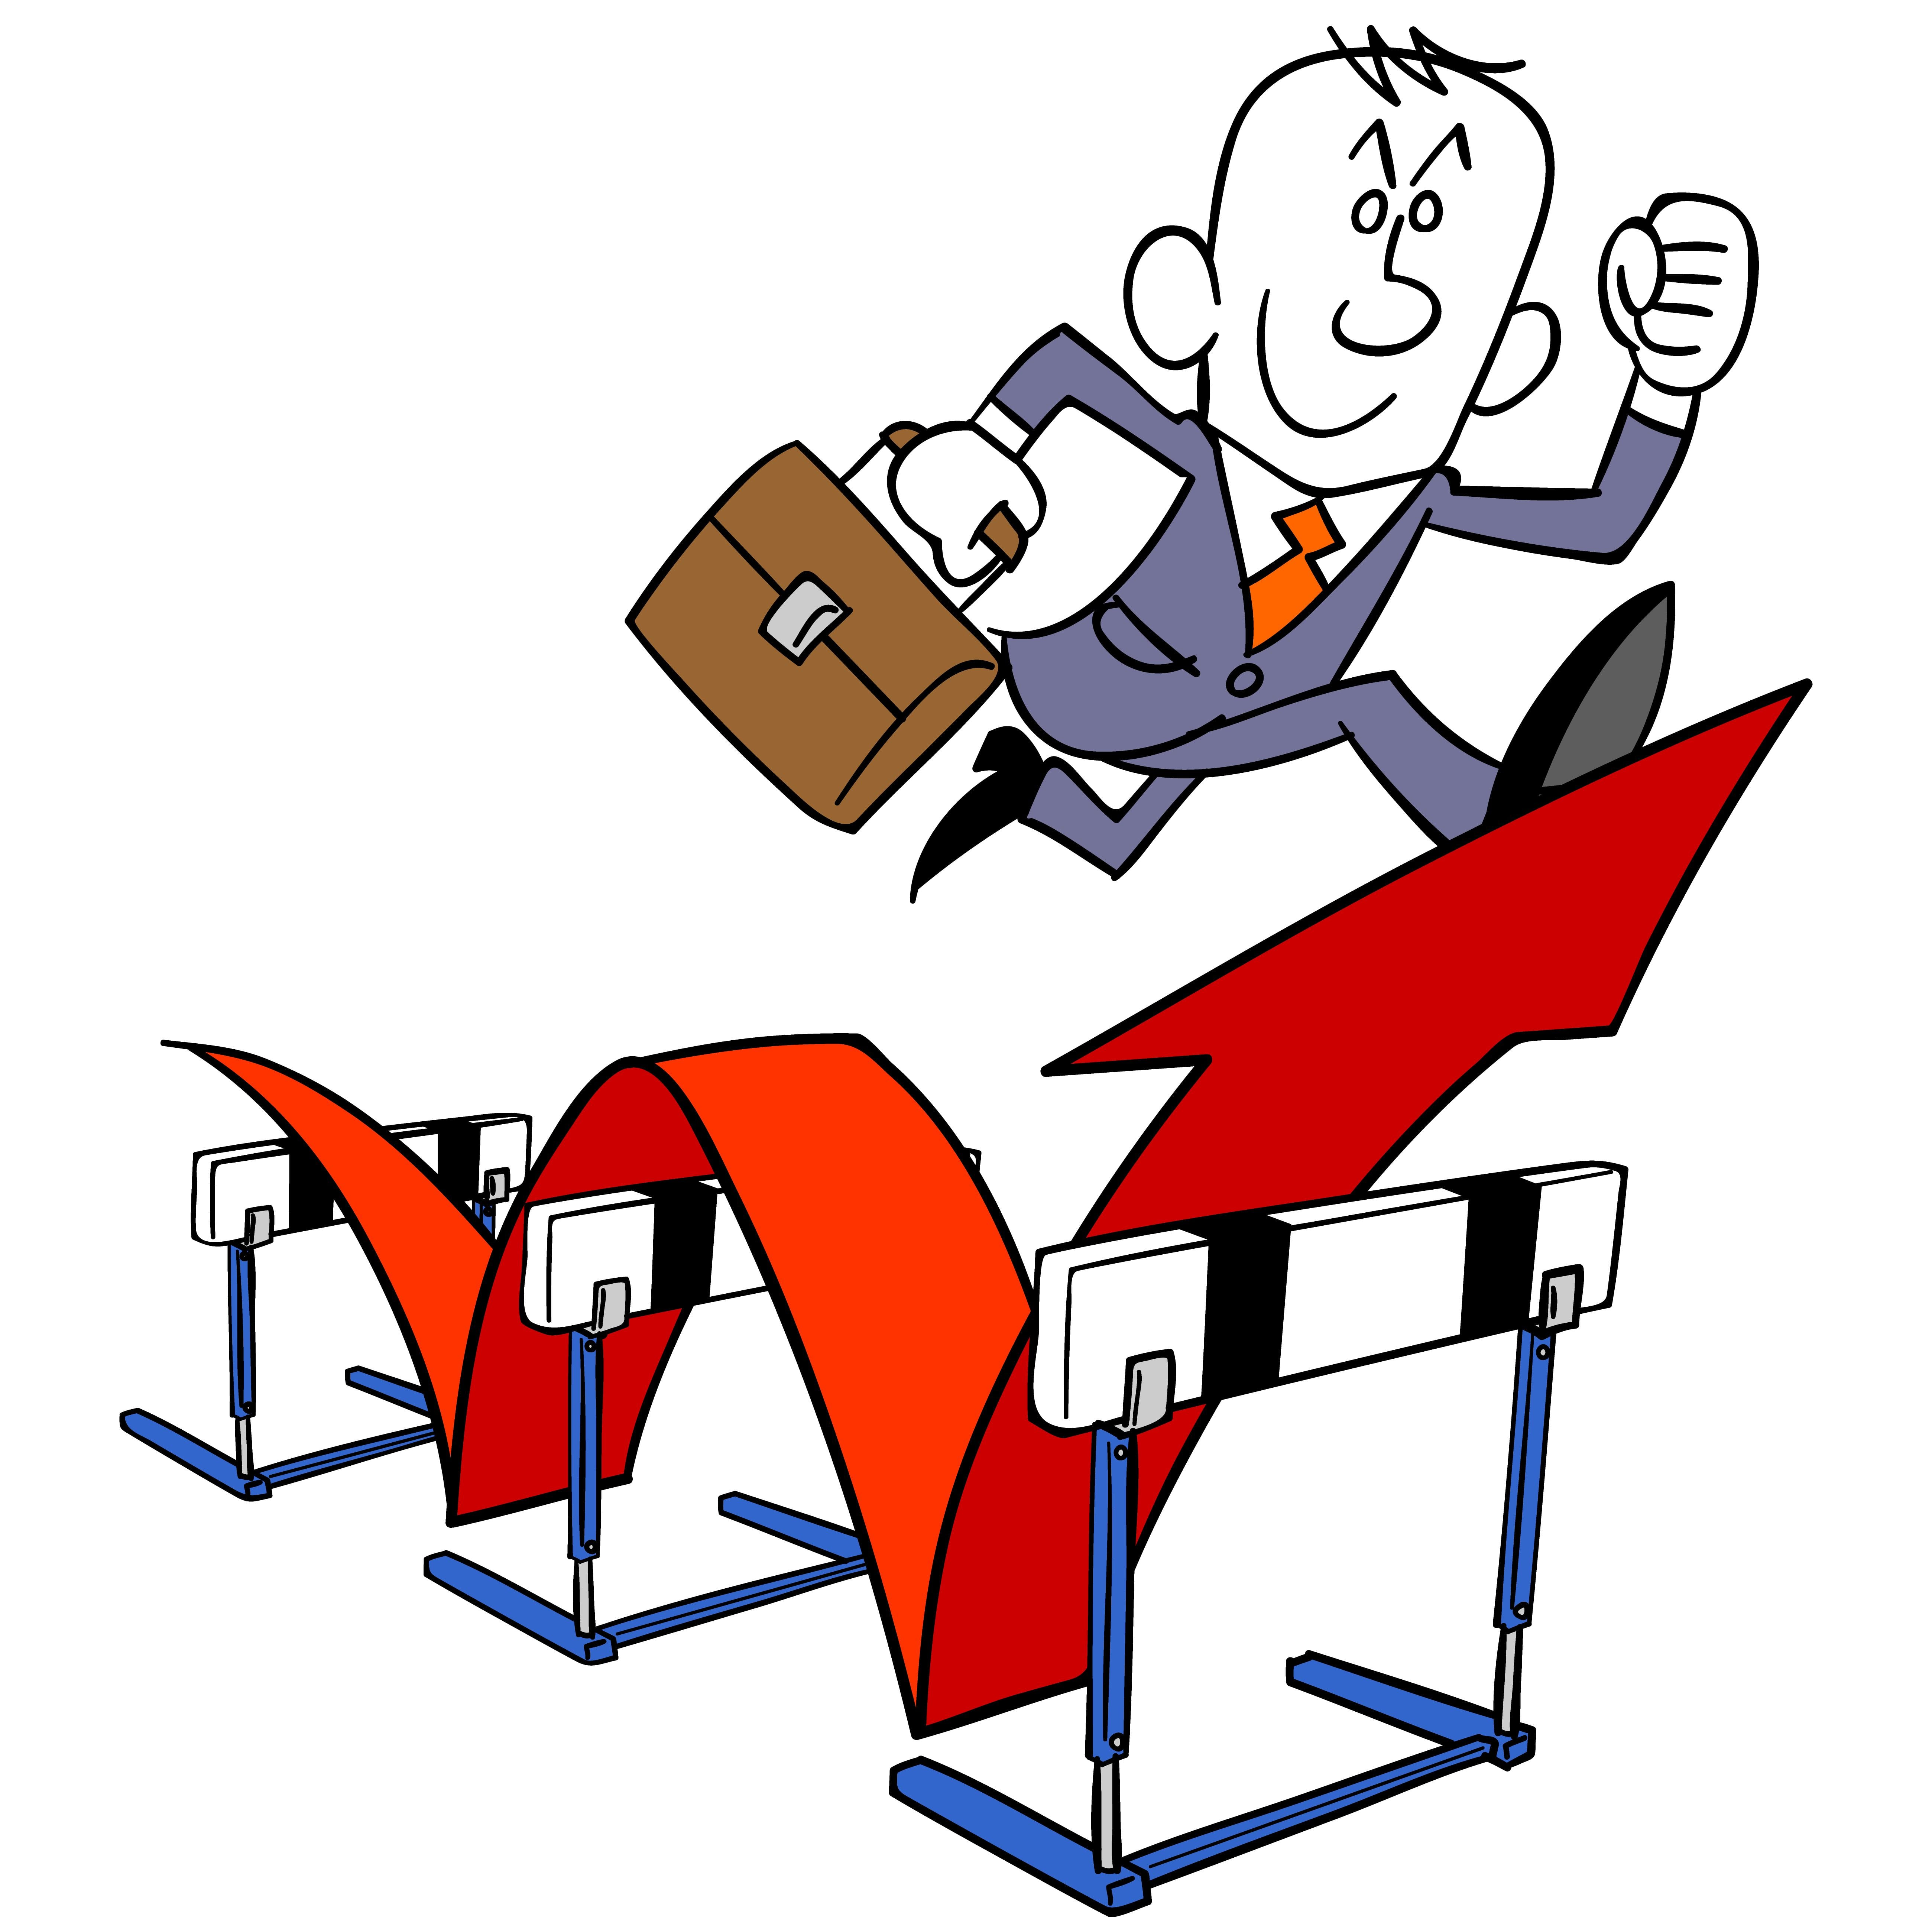 Generalist v. Specialist – The Biggest Post-Recession Mindset Change for Job Seekers